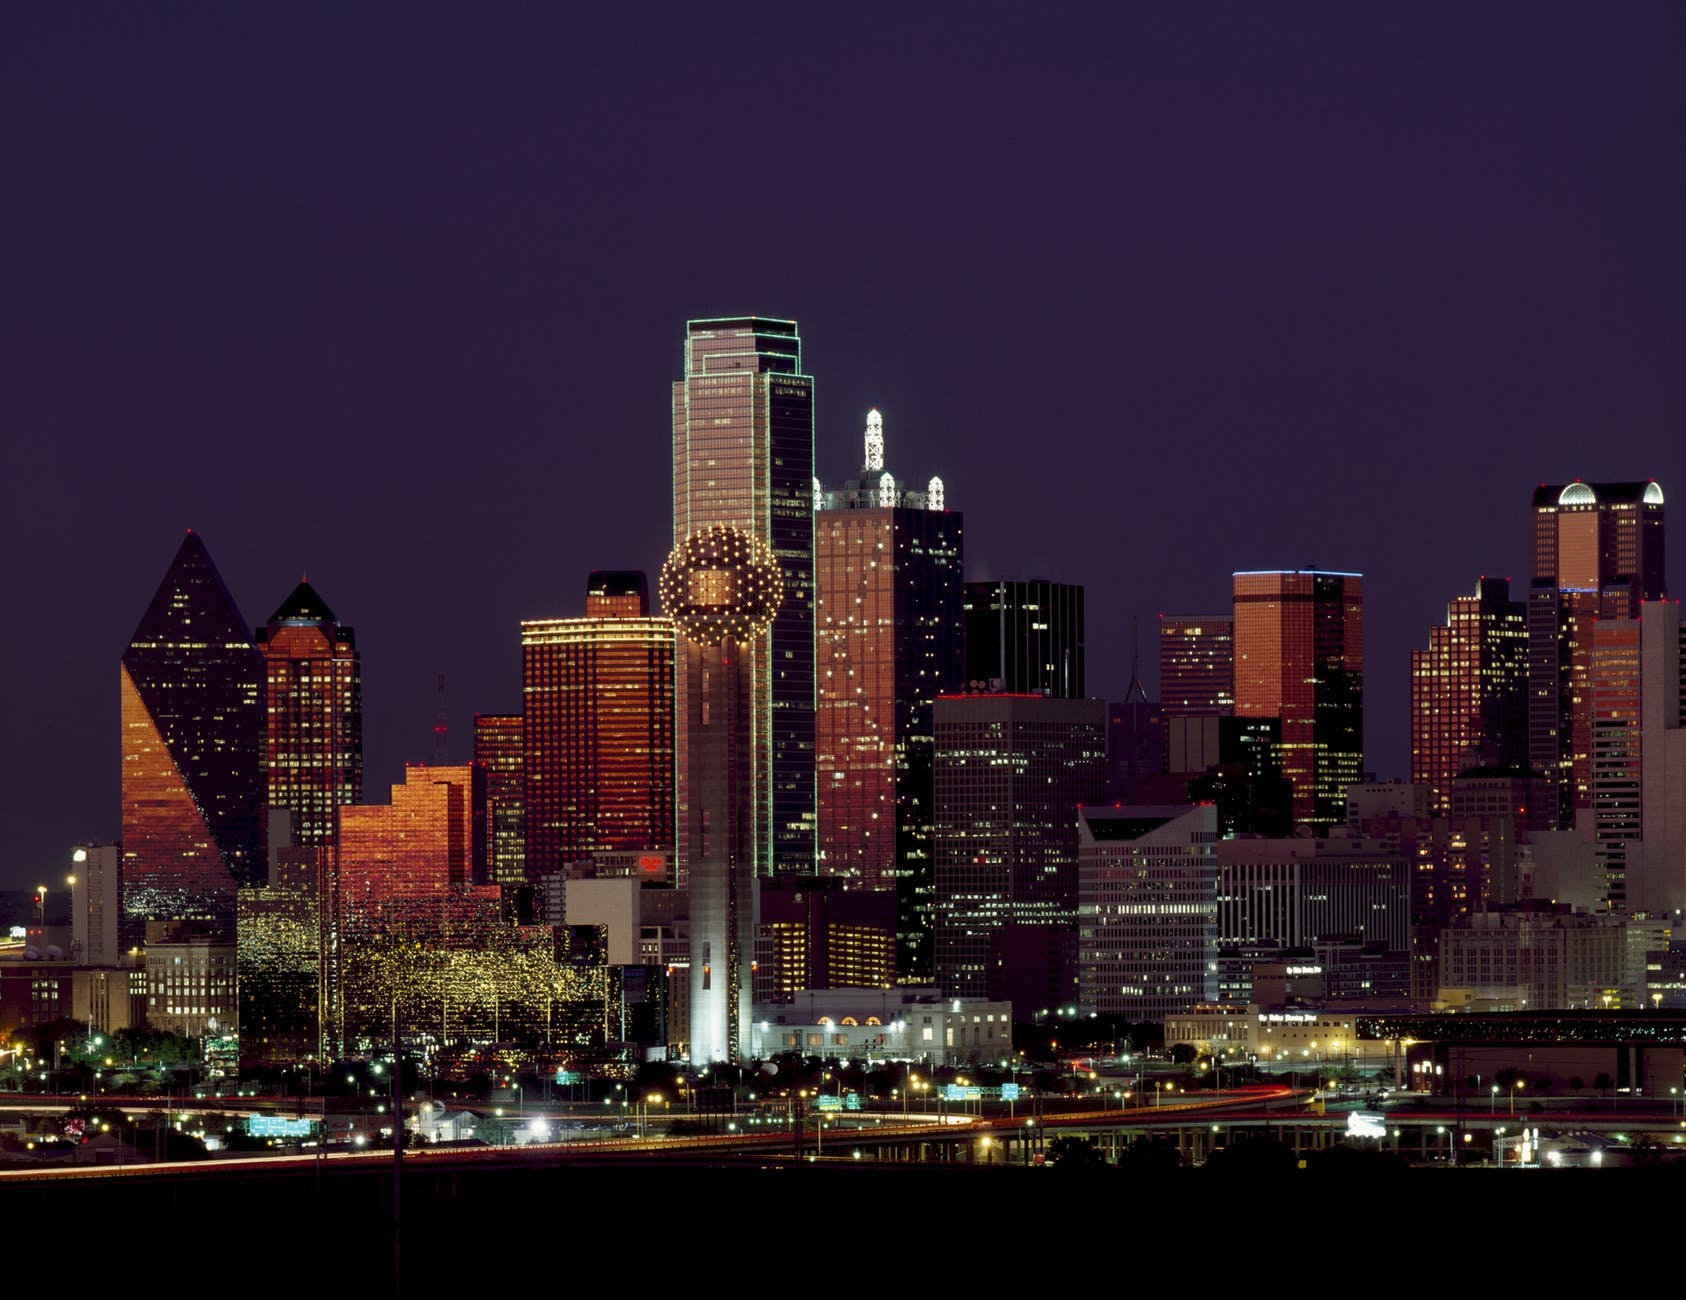 landscape lights skyline buildings